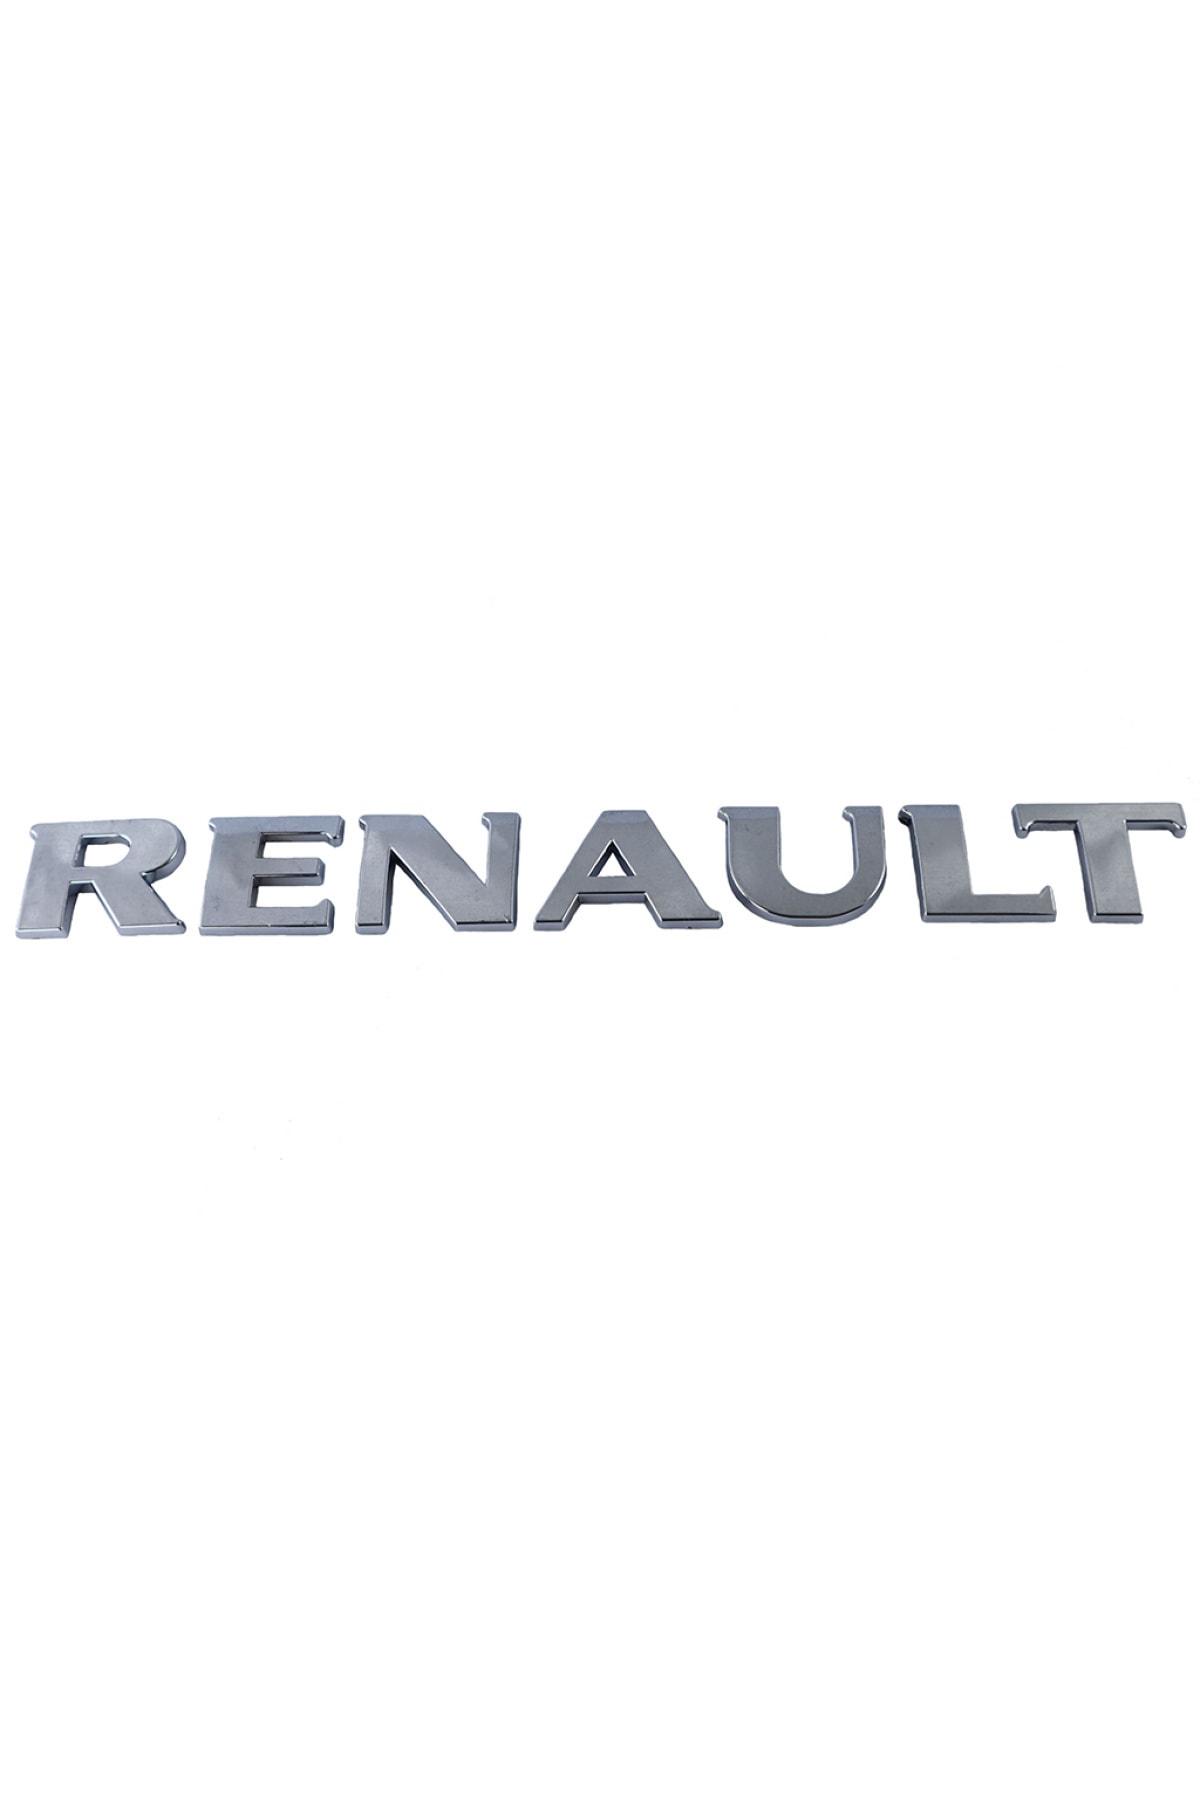 Renault Yazu Megane 2 Clıo 3 Renault Yazısı